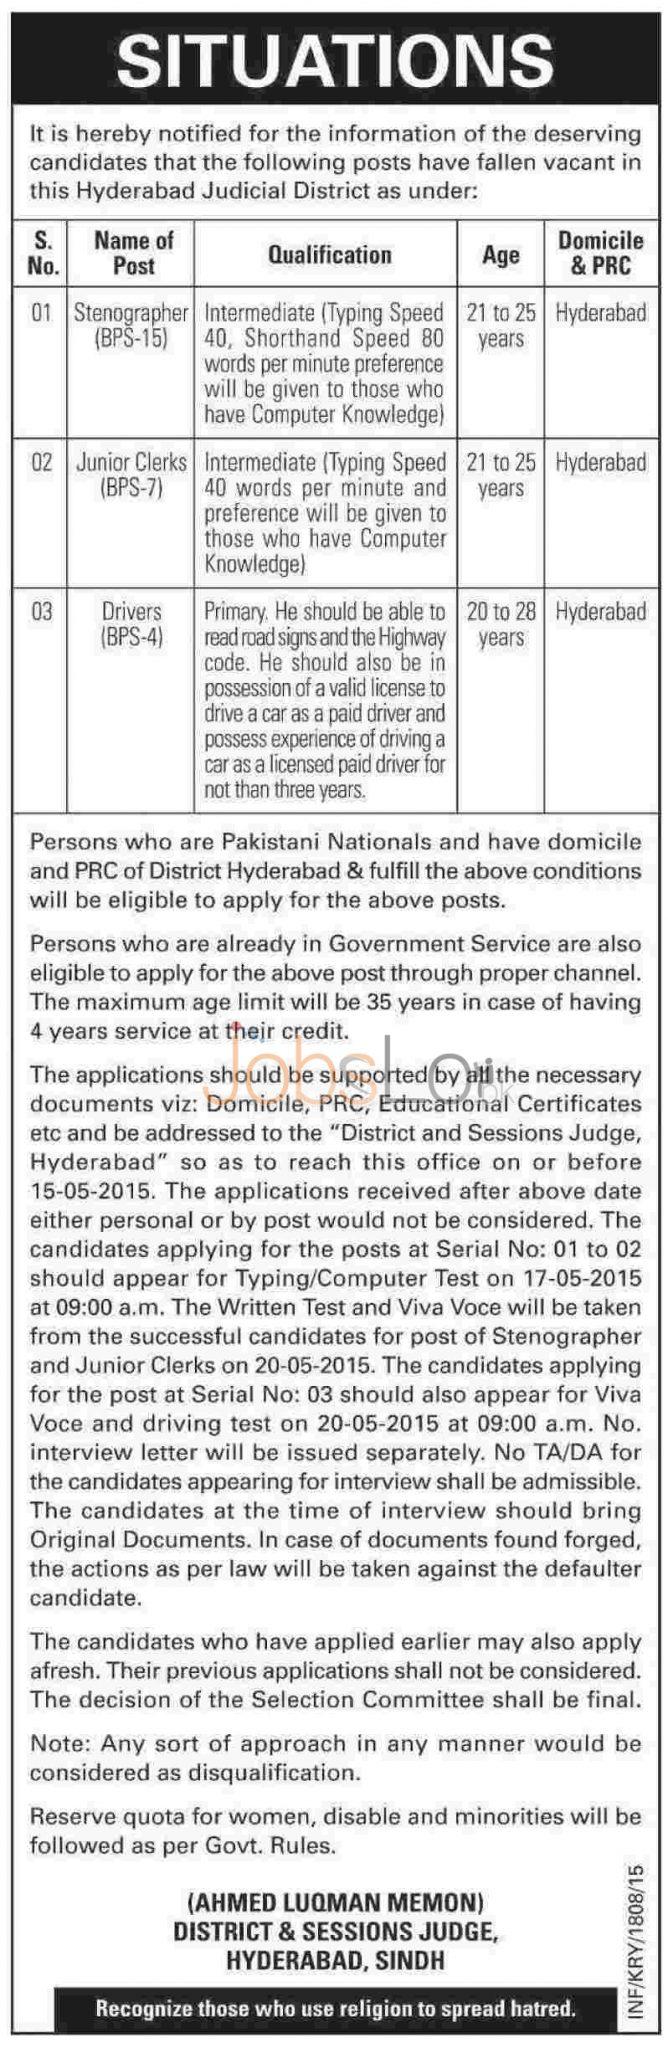 District & Session Court Hyderabad Sindh Jobs